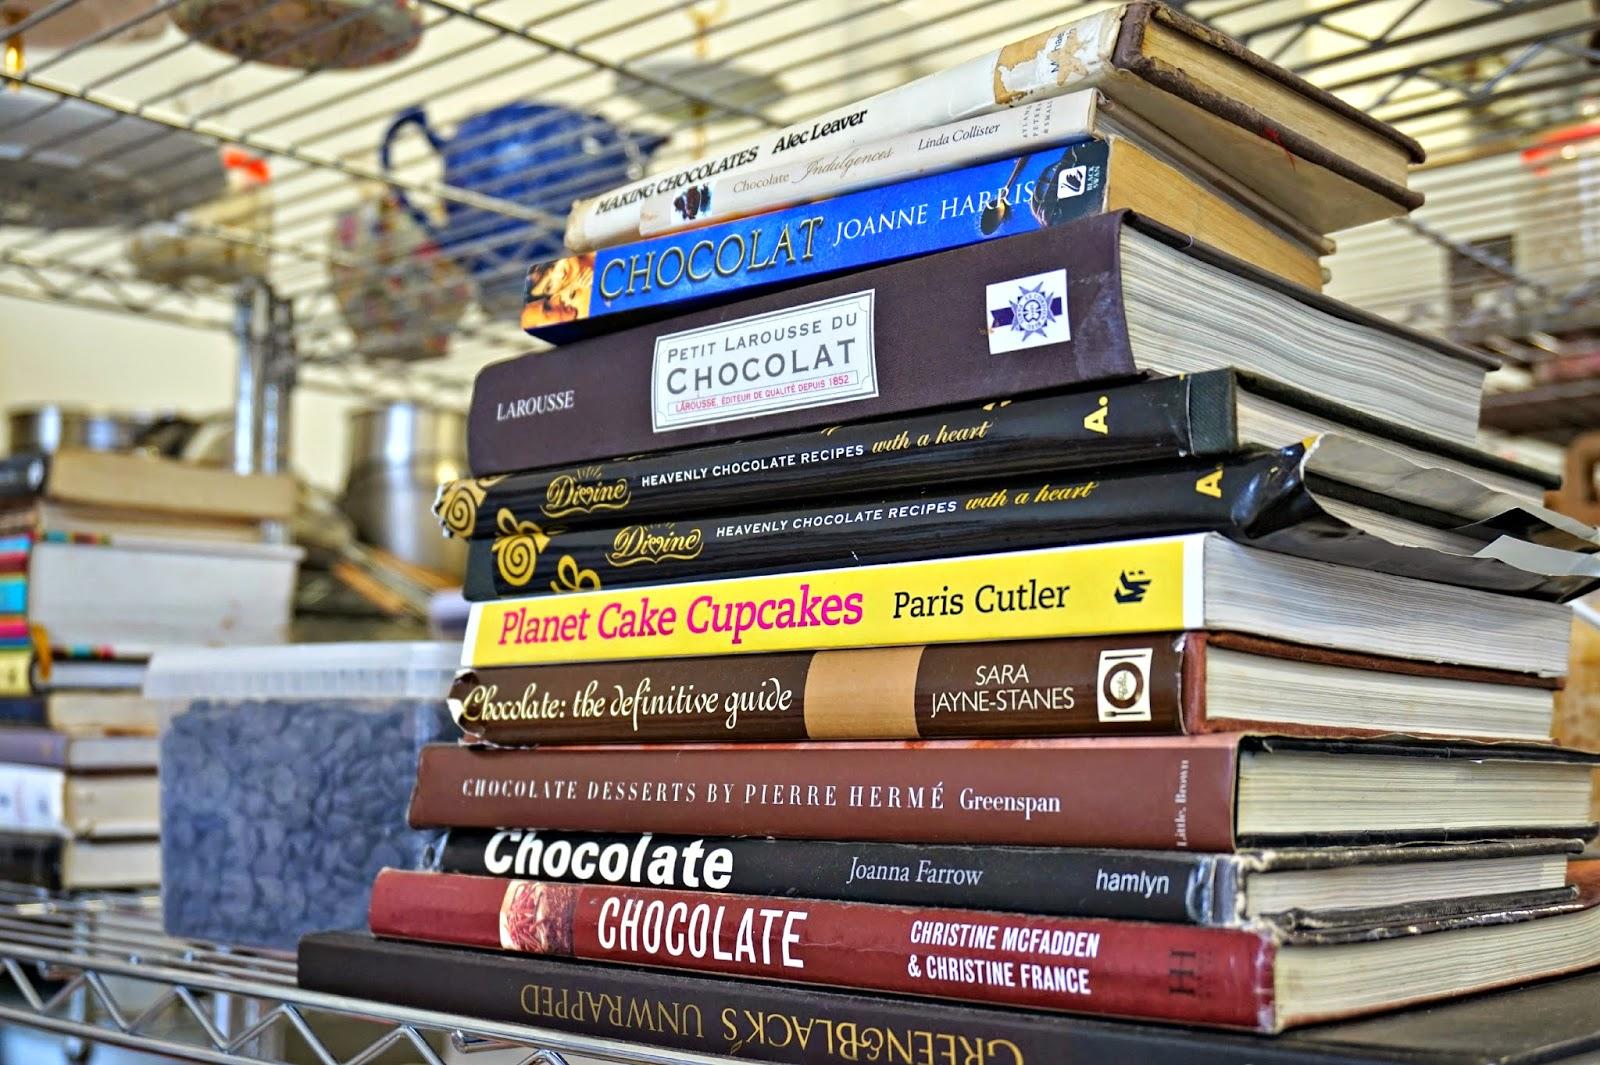 Chocolate recipe books